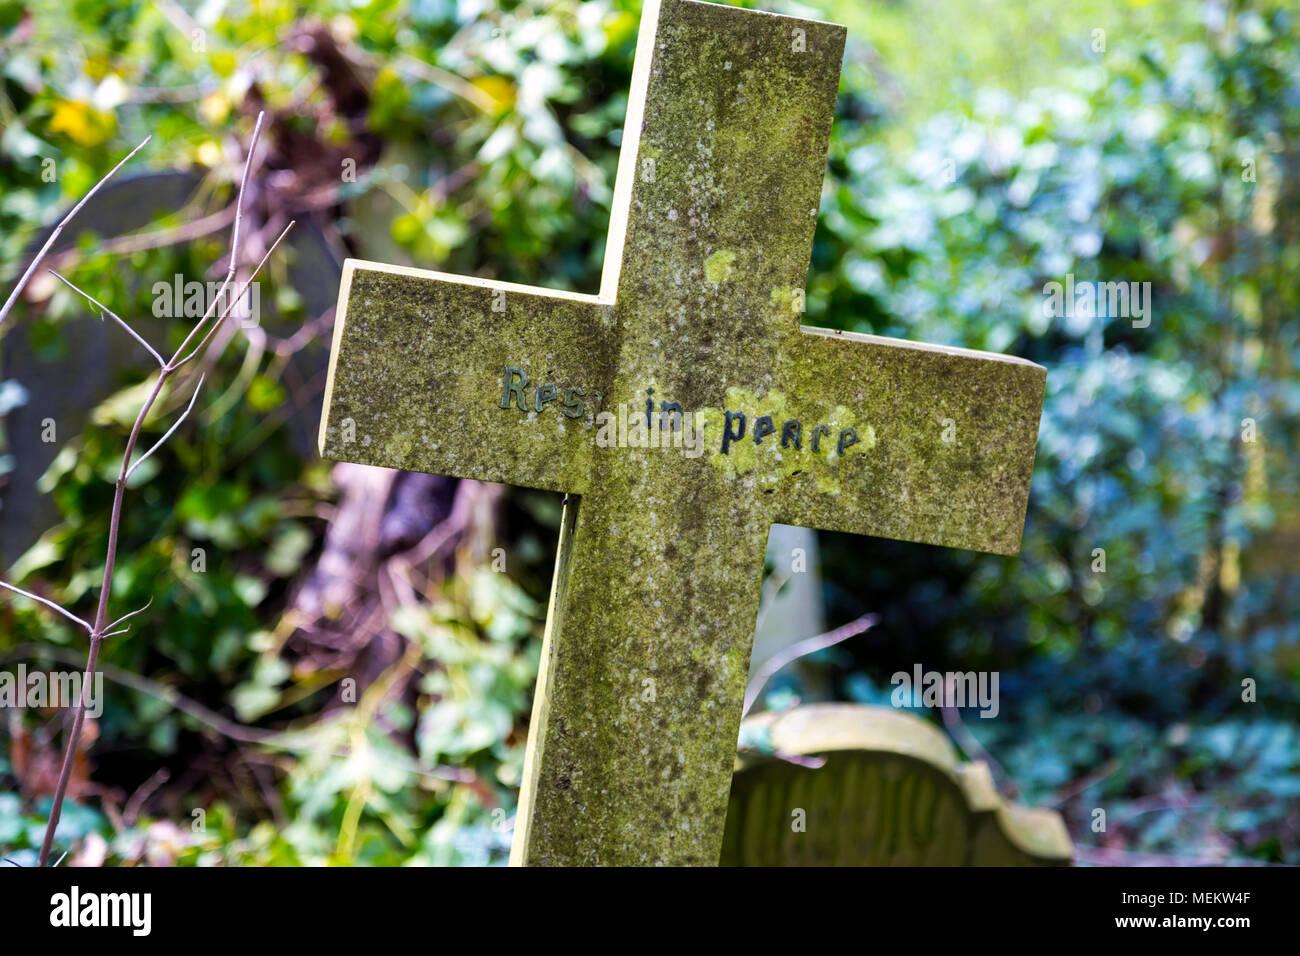 Rest_in_peace Stockfotos & Rest_in_peace Bilder - Alamy